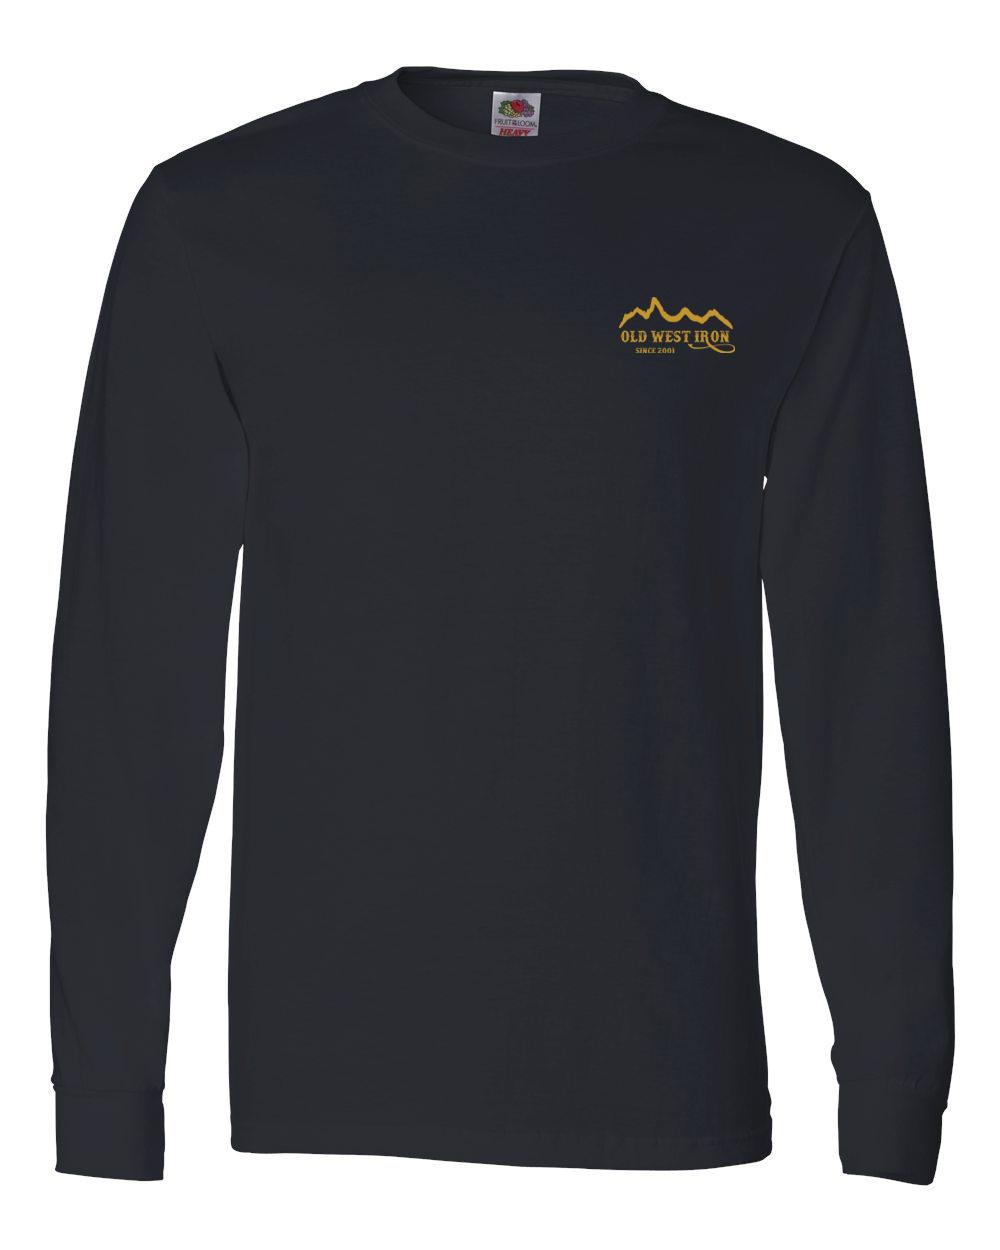 custom design of Fruit of the Loom 4930R Heavy Cotton Long Sleeve T-Shirt